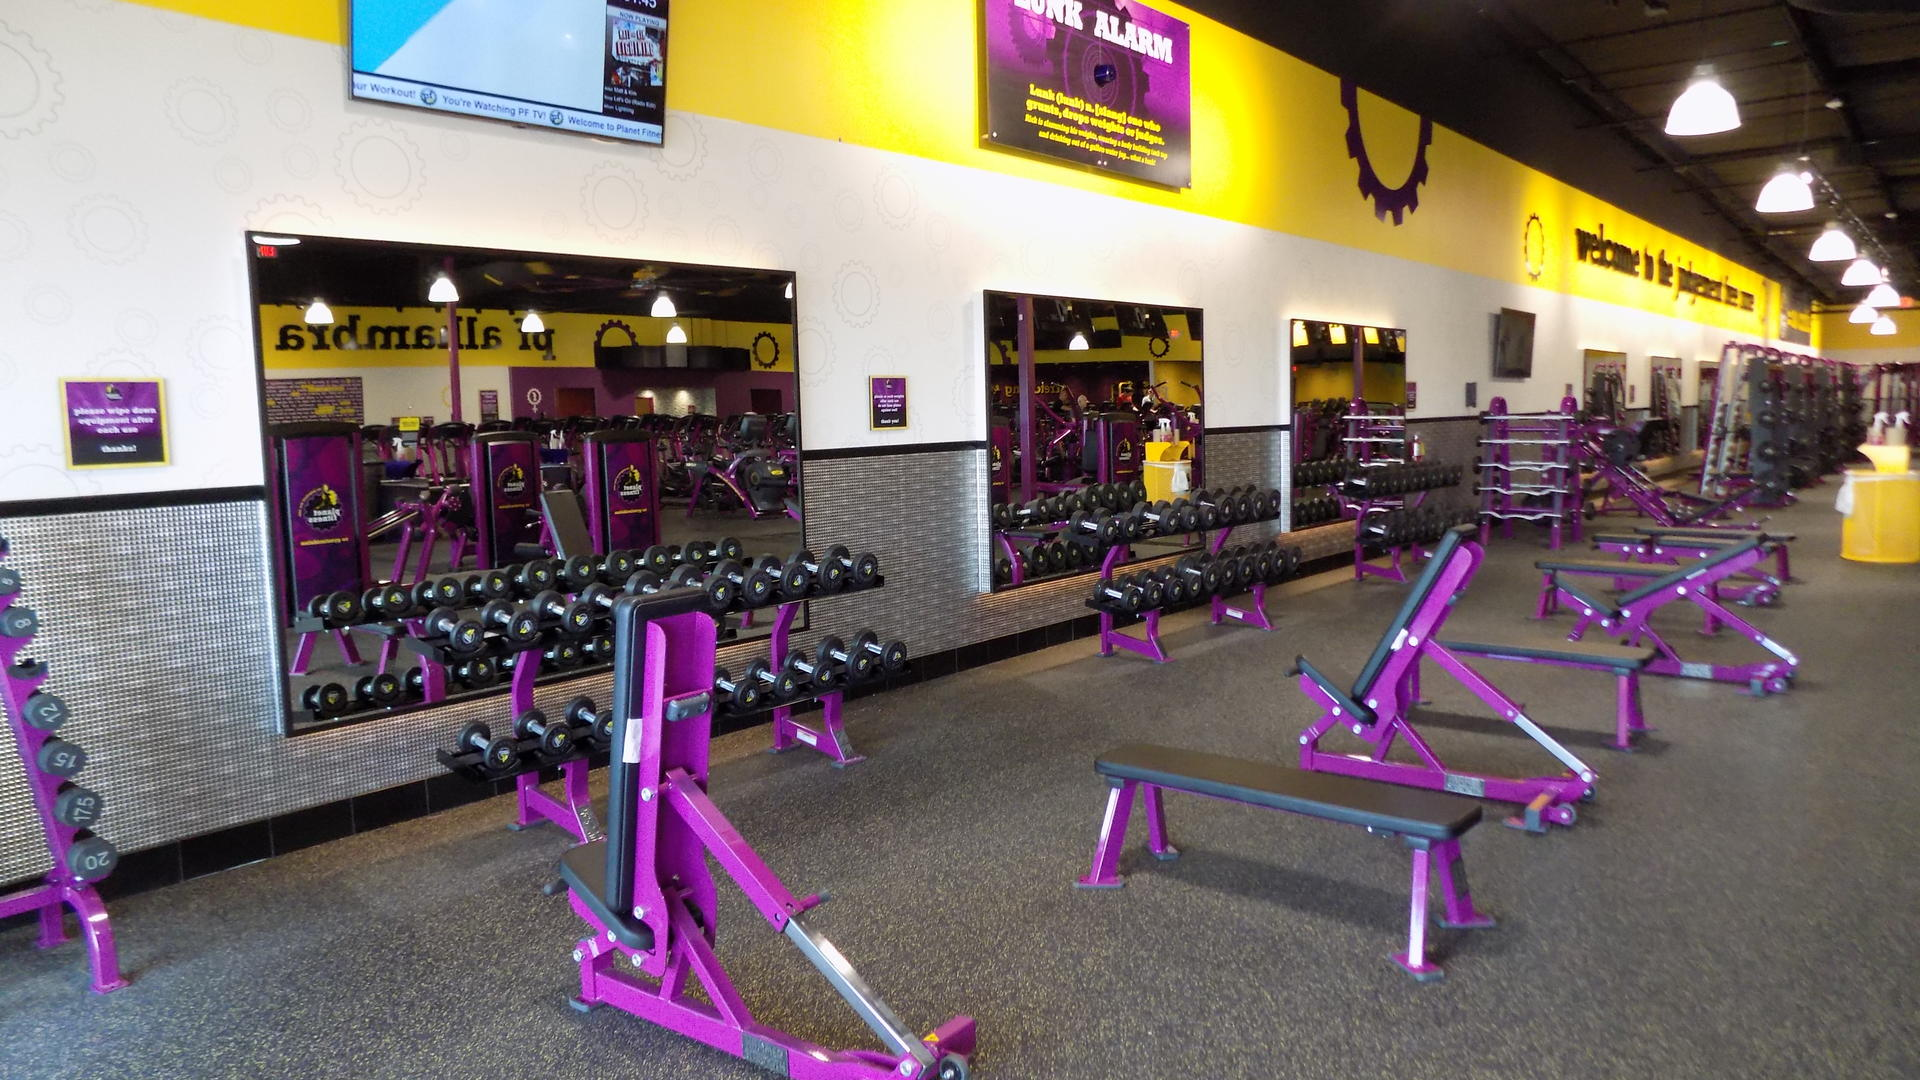 Gym in Phoenix Alhambra AZ  1625 W Camelback Rd  Planet Fitness